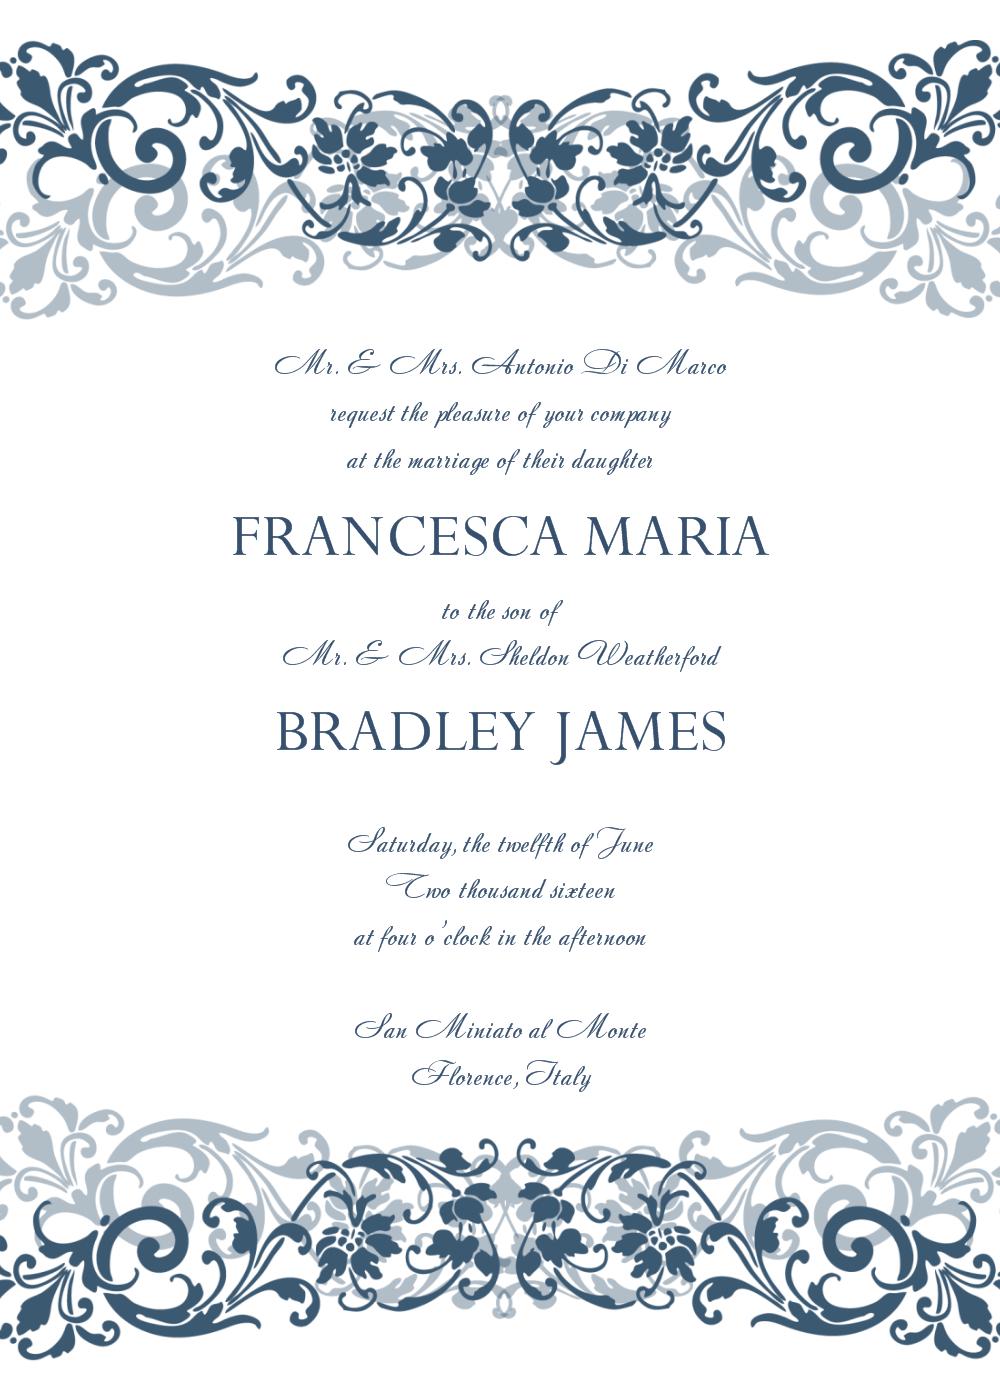 Free Wedding Invitation Templates For Word   Wedding Invitation - Free Printable Wedding Invitations